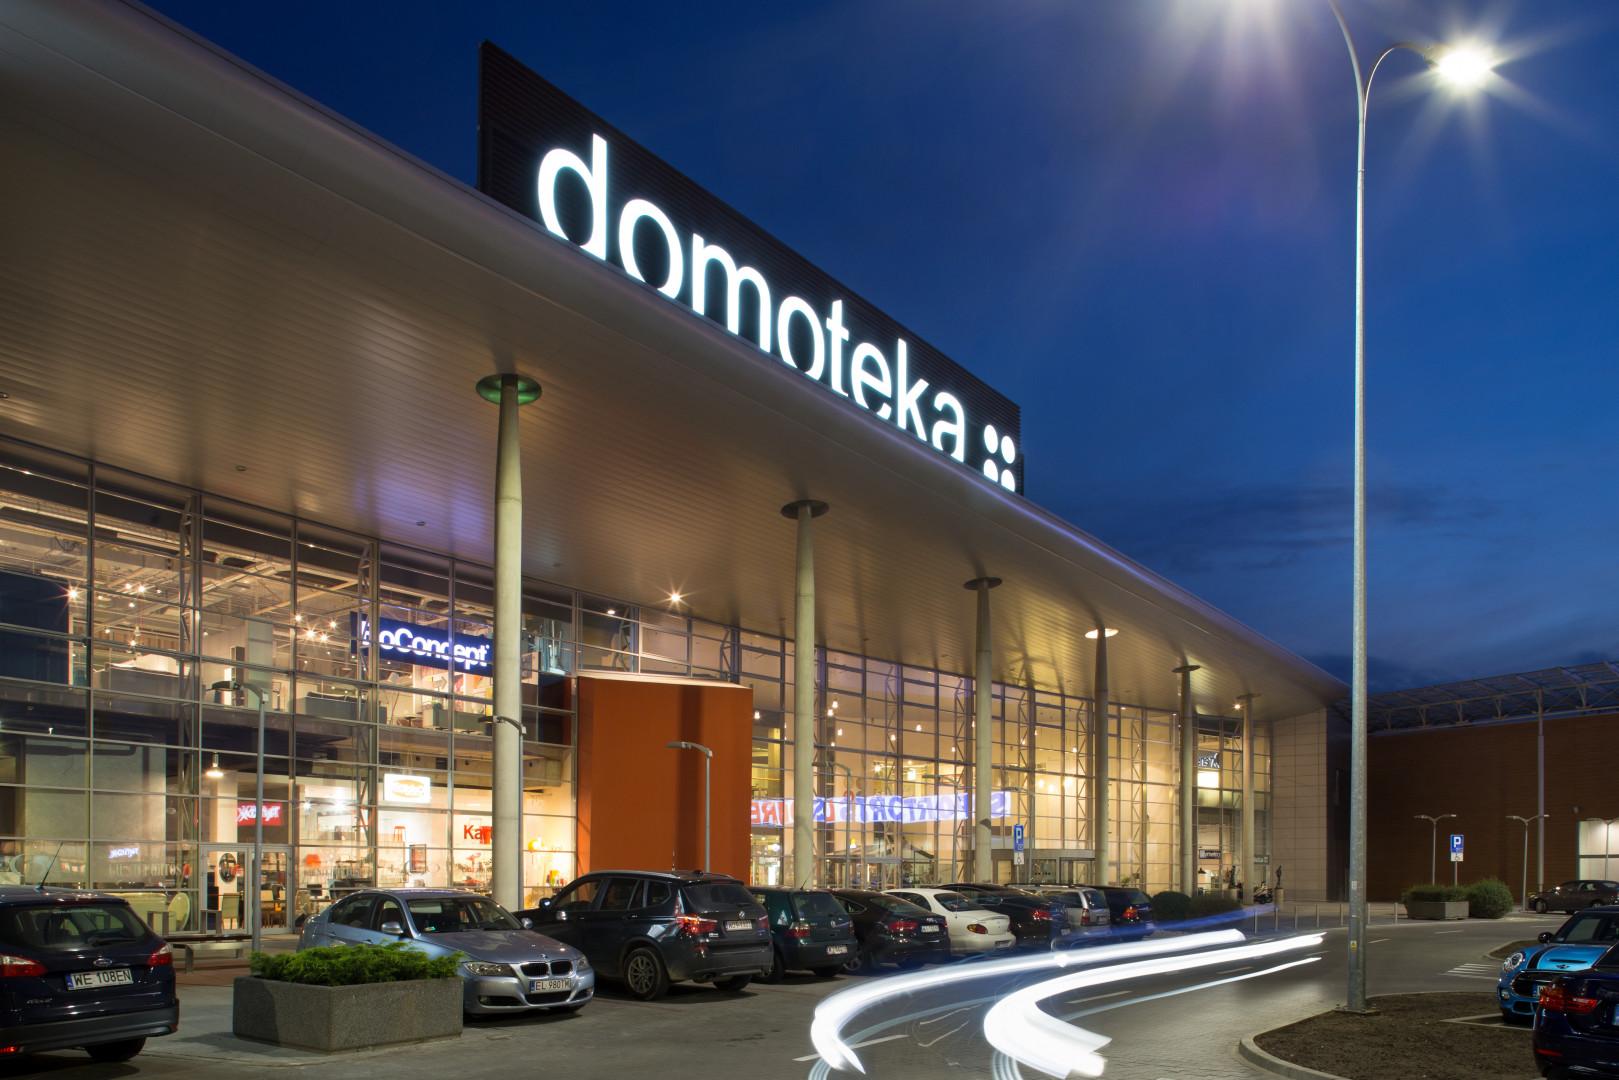 Centrum handlowe Domoteka. Fot. Domoteka